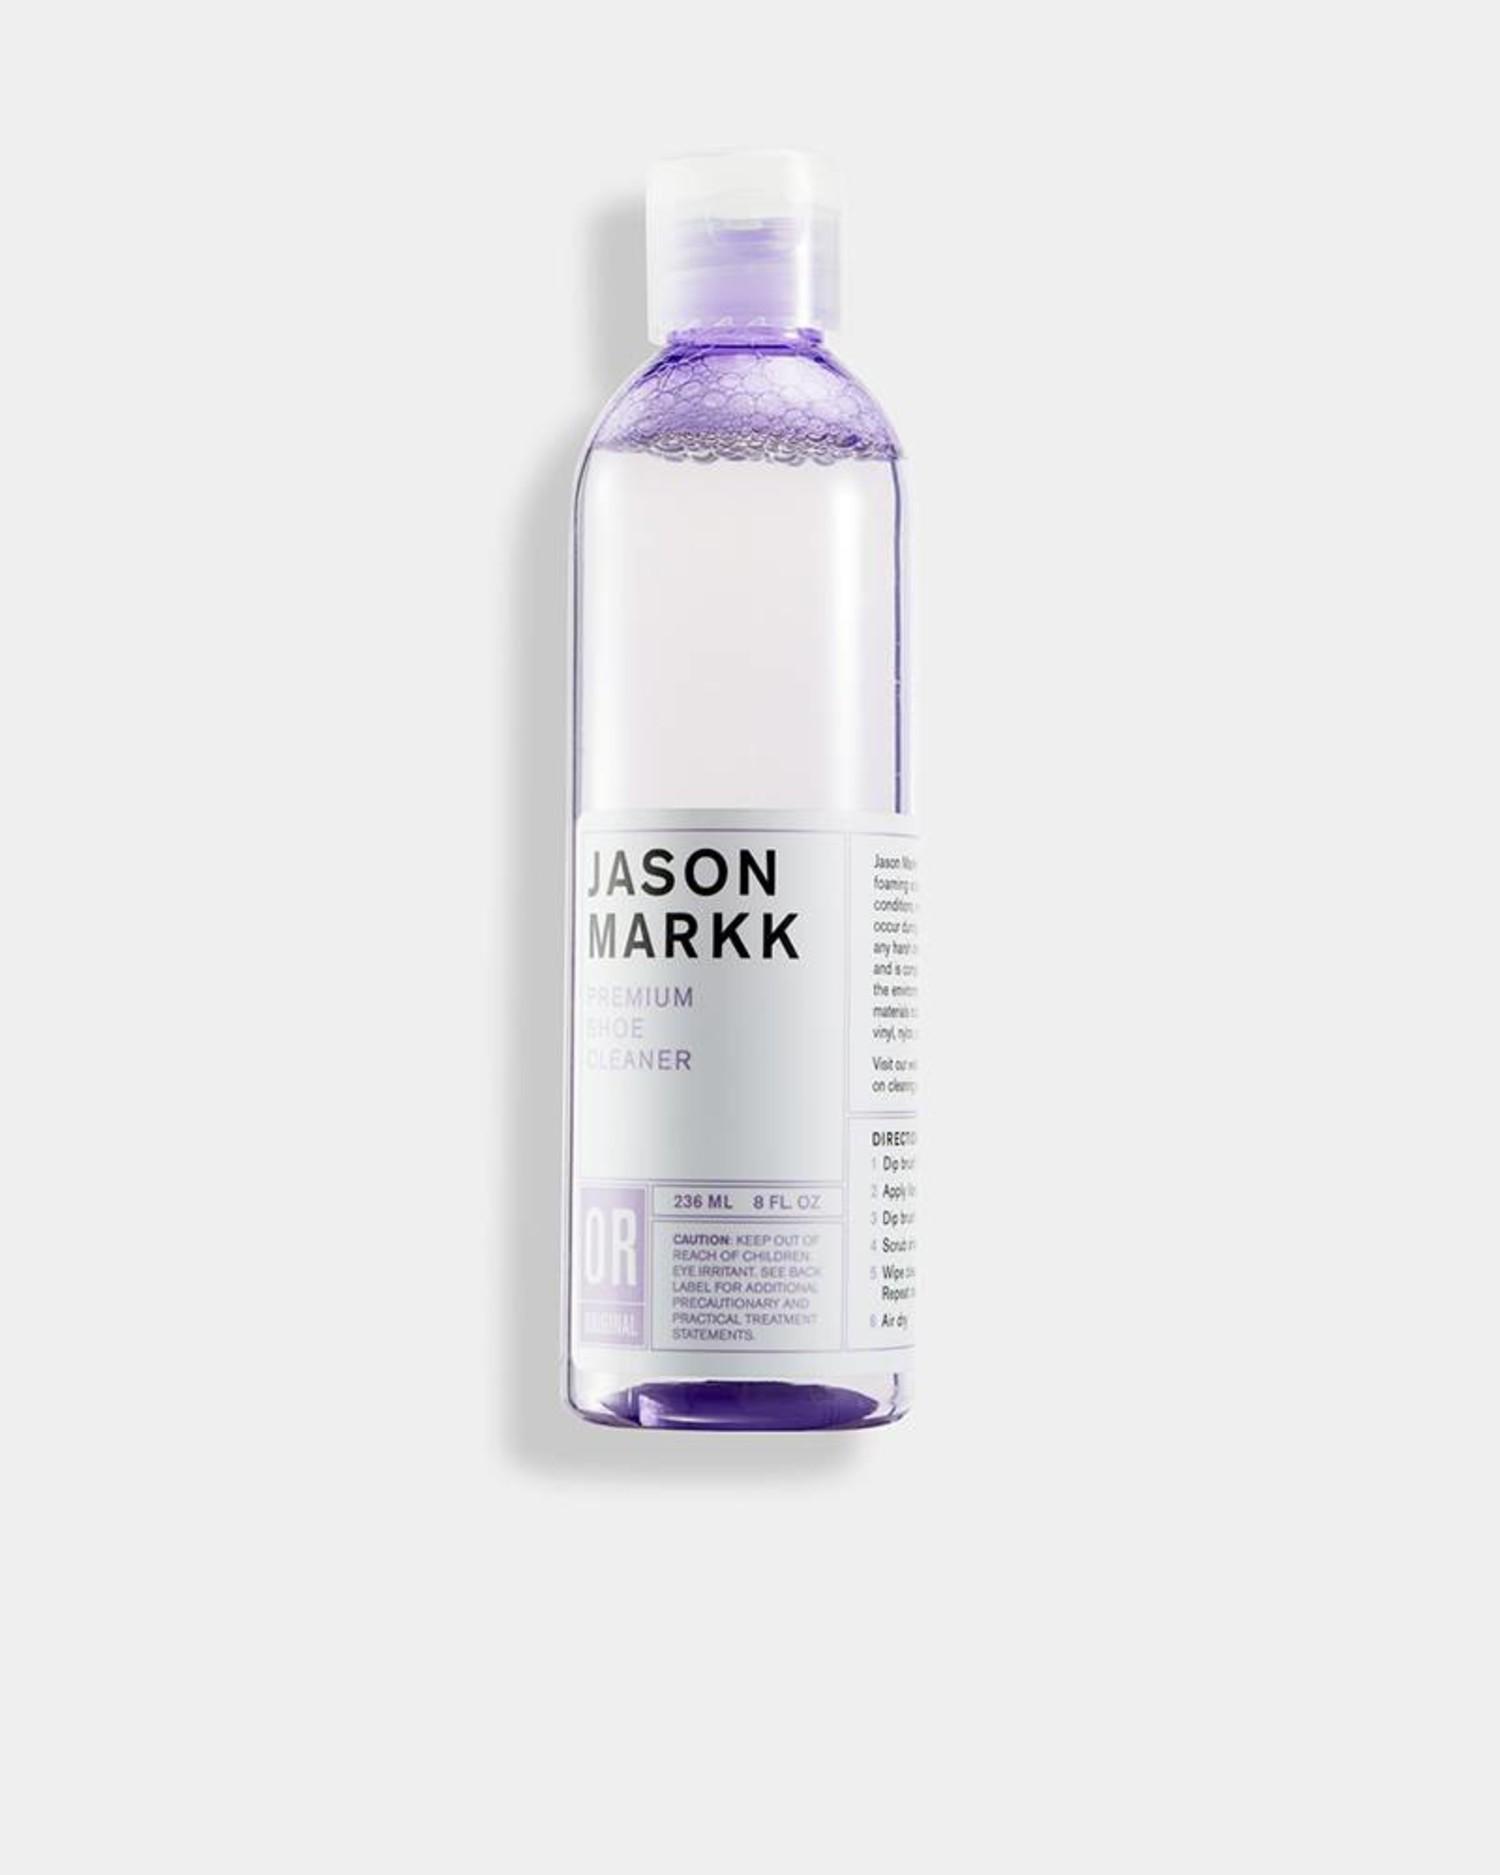 Jason Markk Premium Shoe Cleaner 8OZ - 236ML